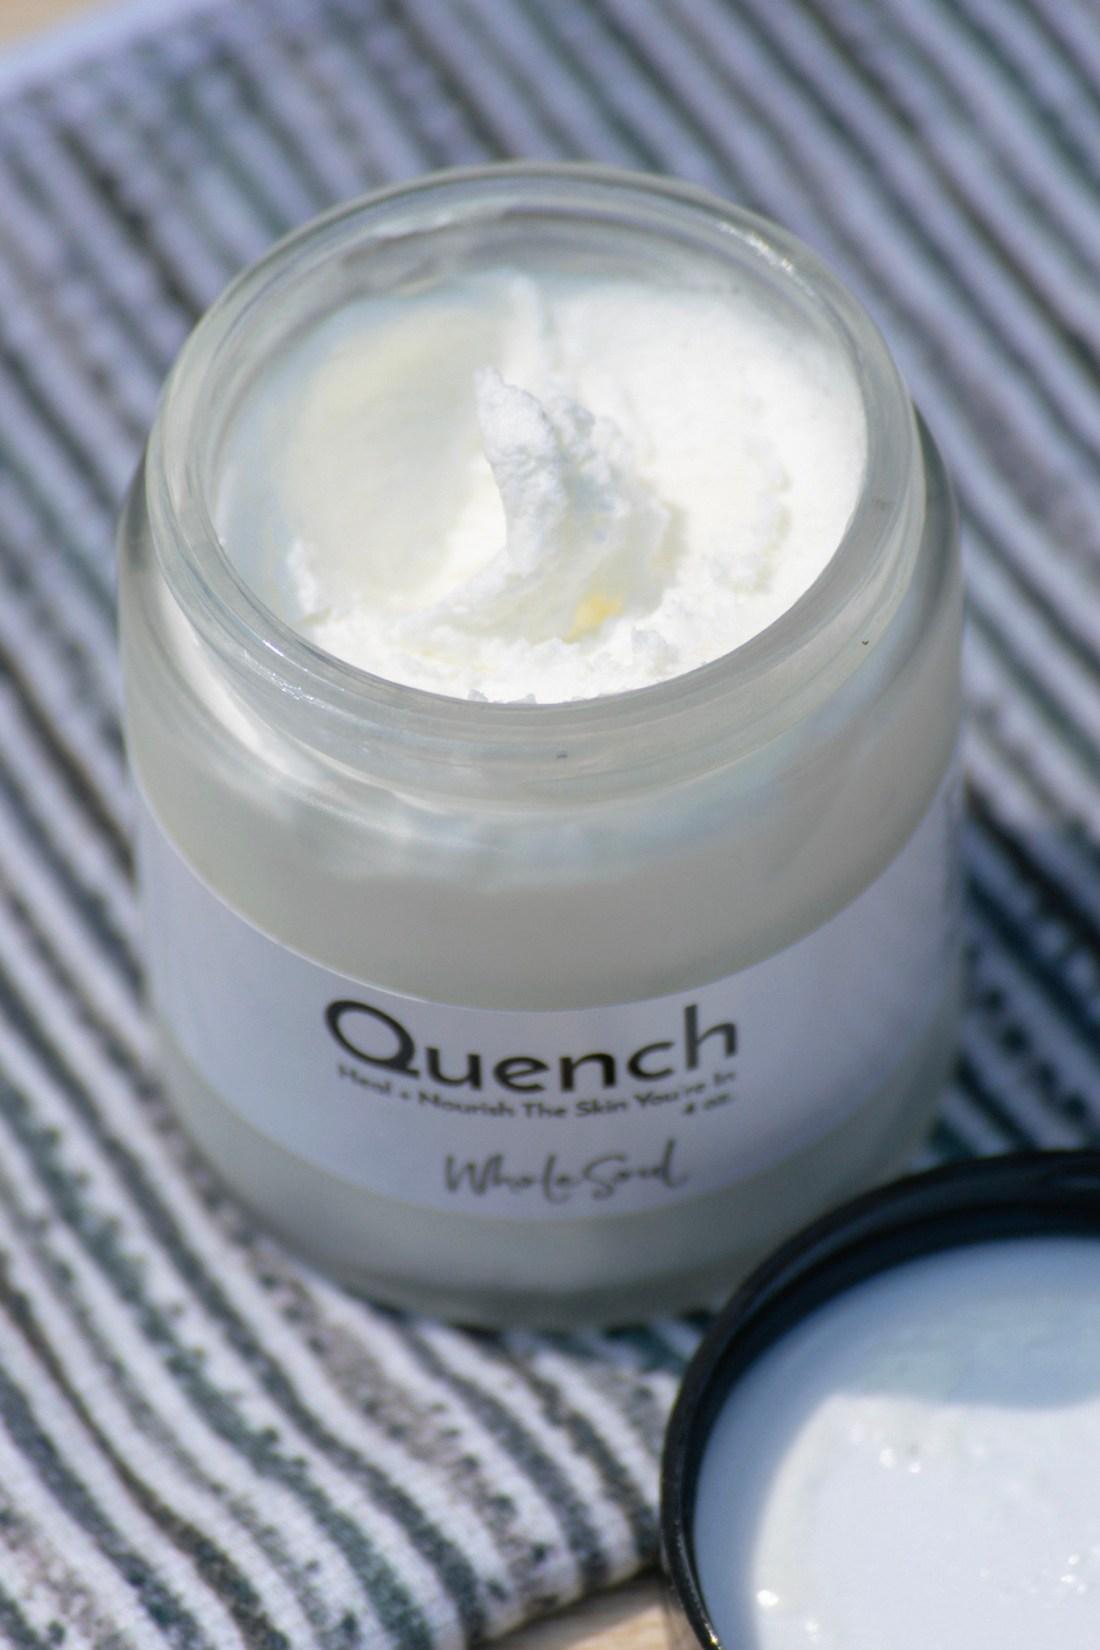 Quench Body Butter